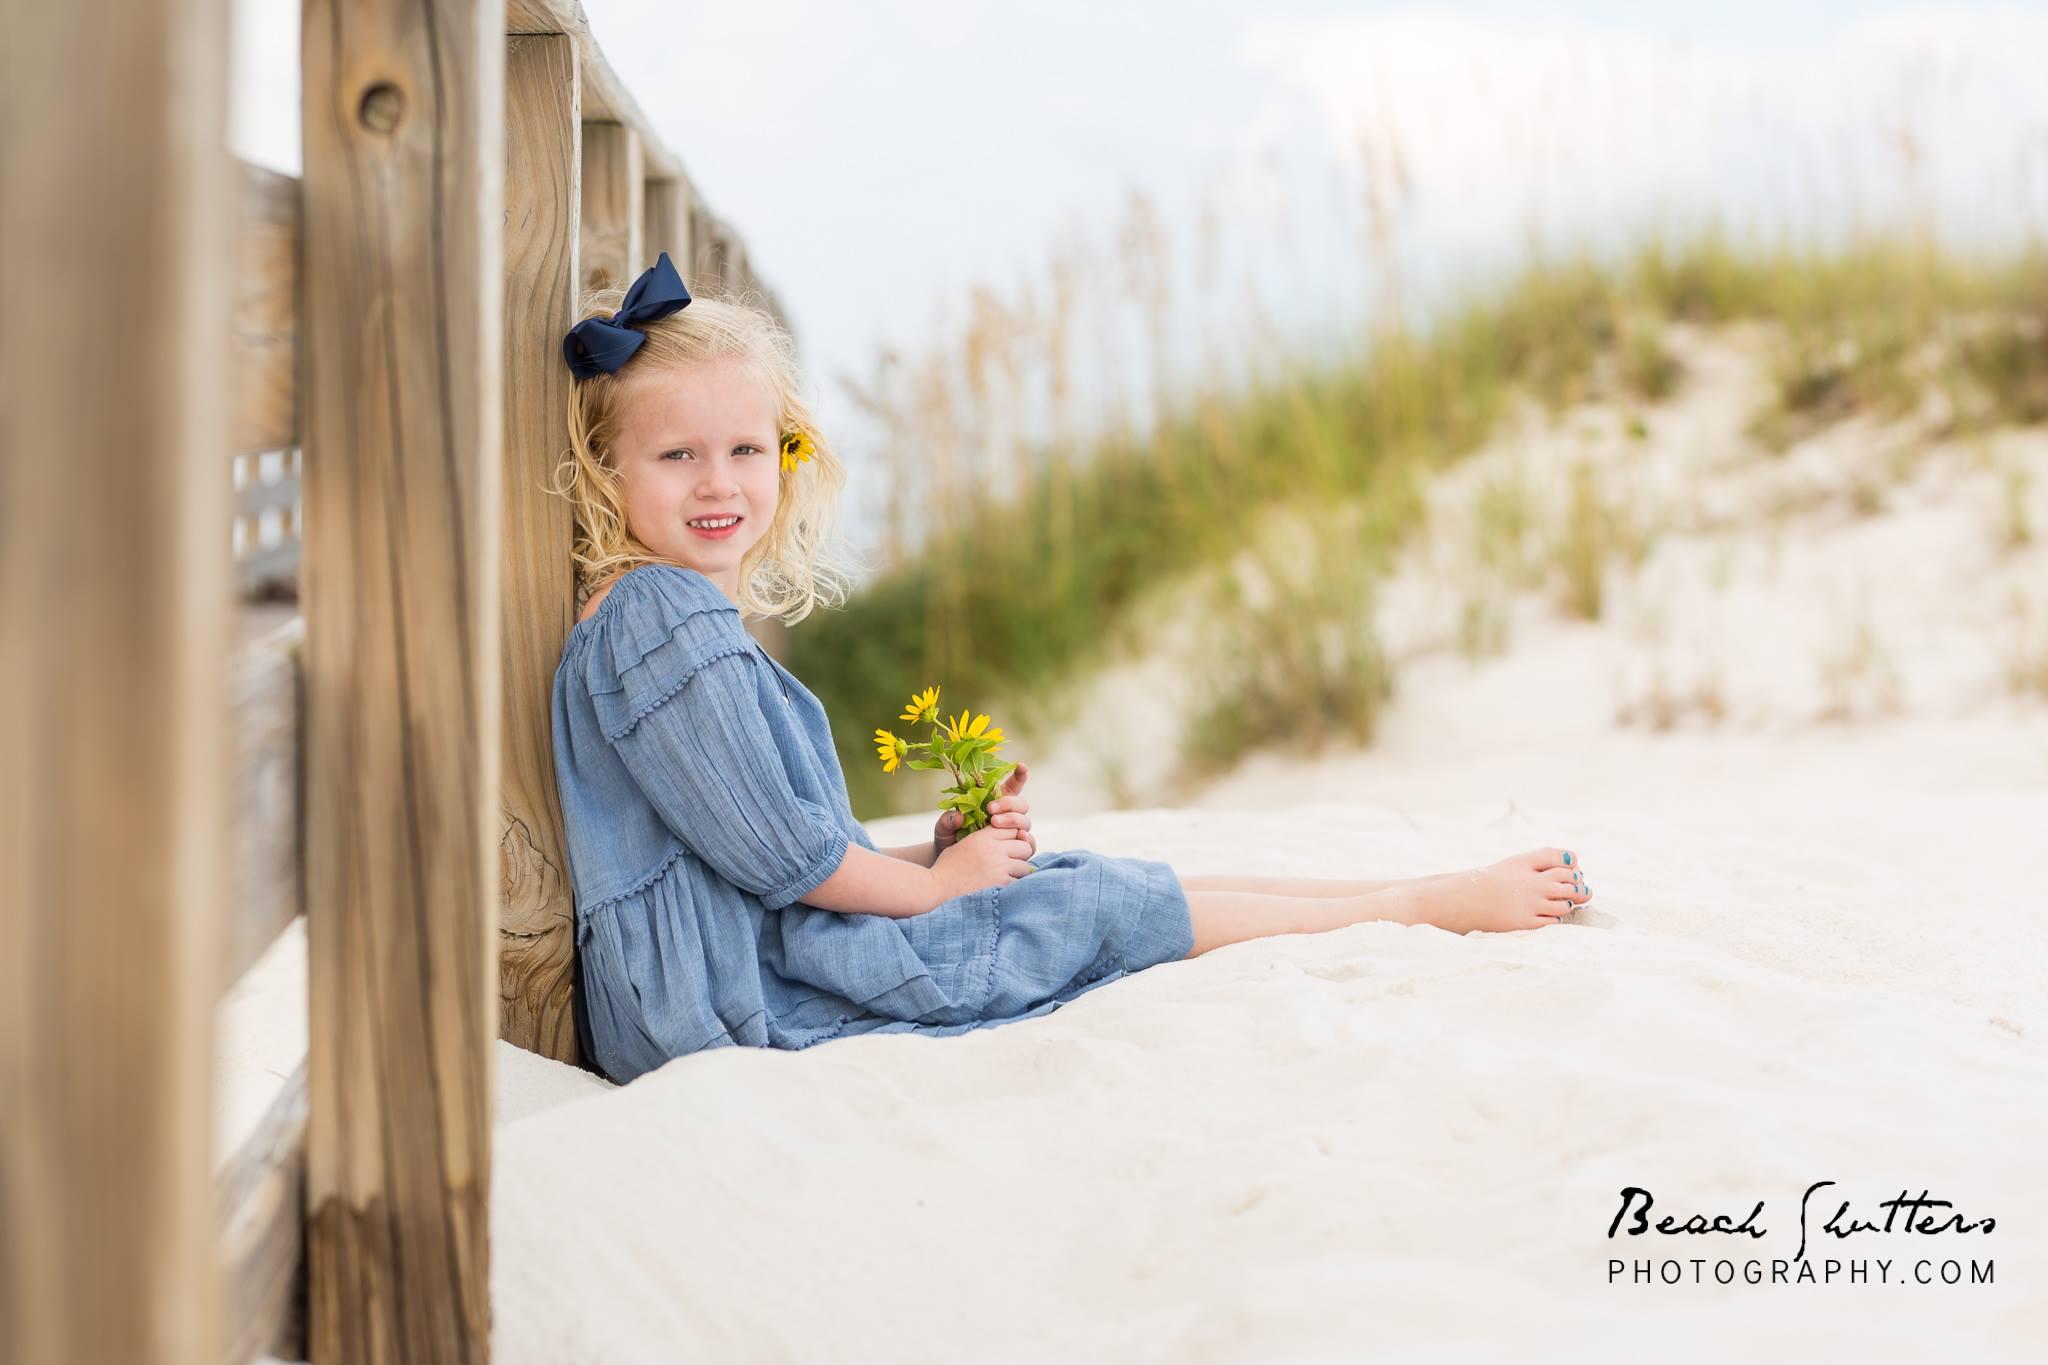 photographer in Orange Beach Alabama takes children's photos